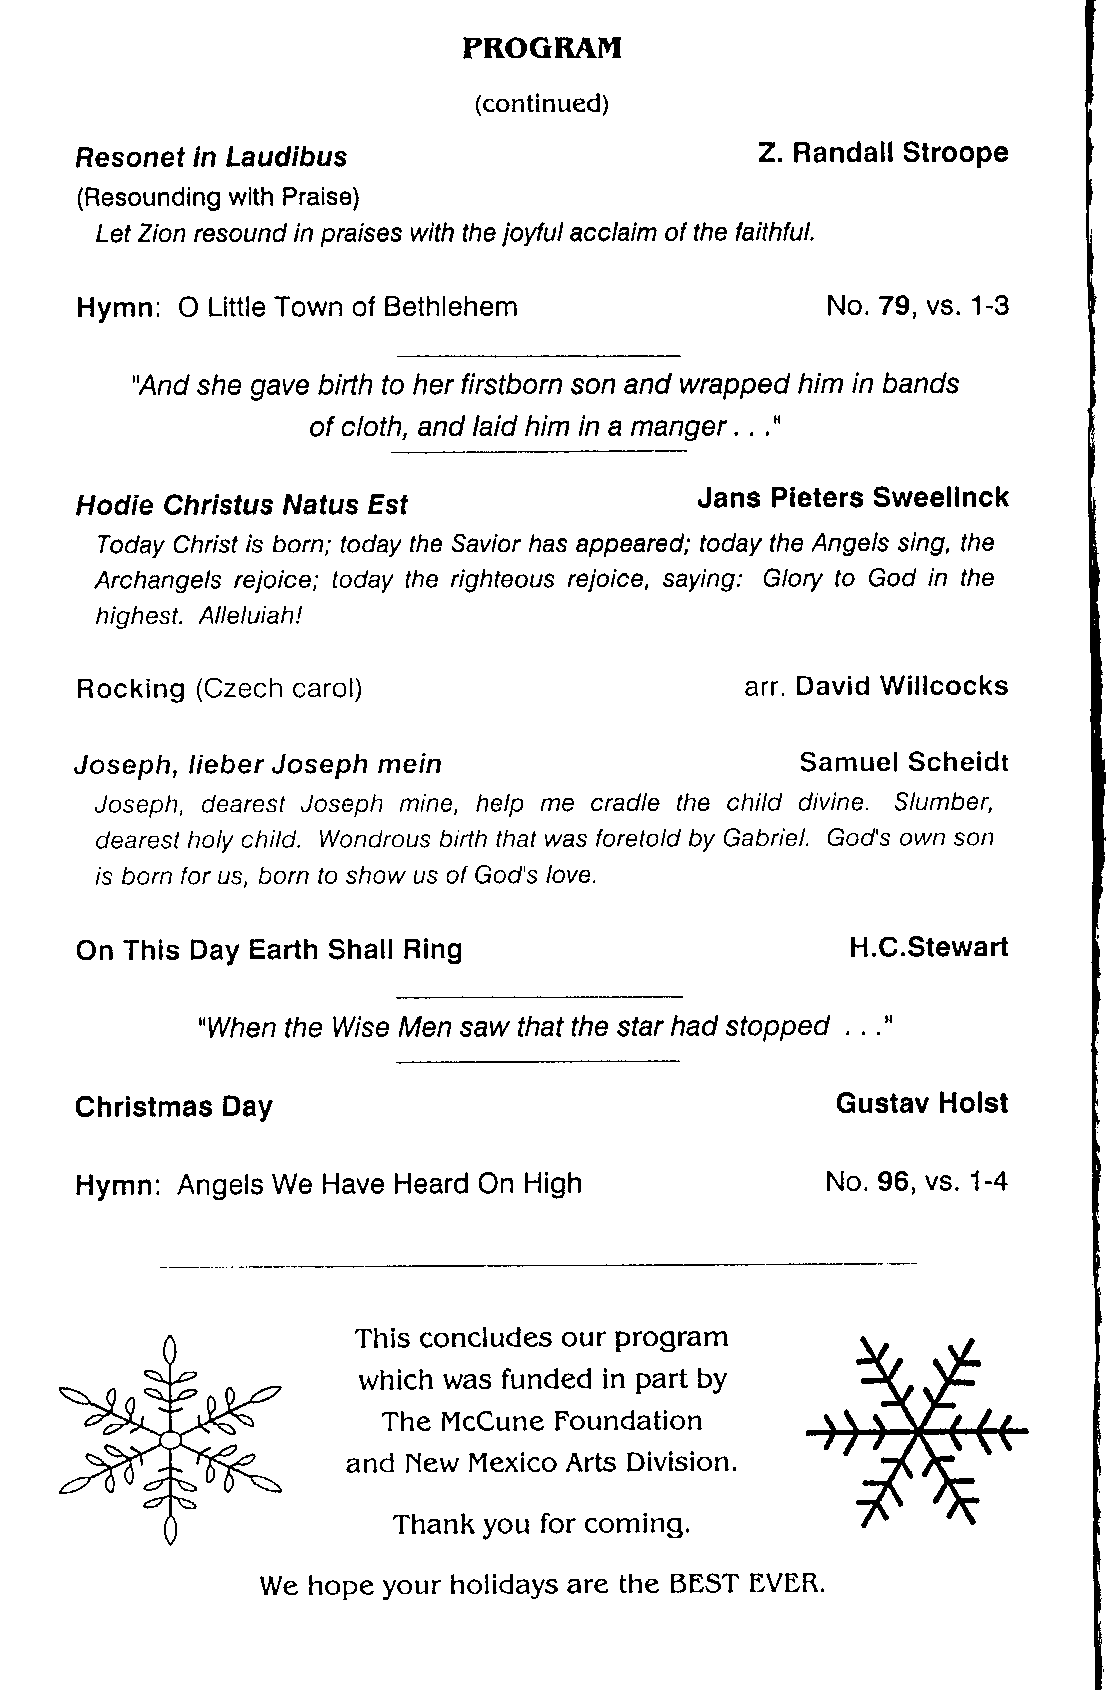 1999-dec-program-2